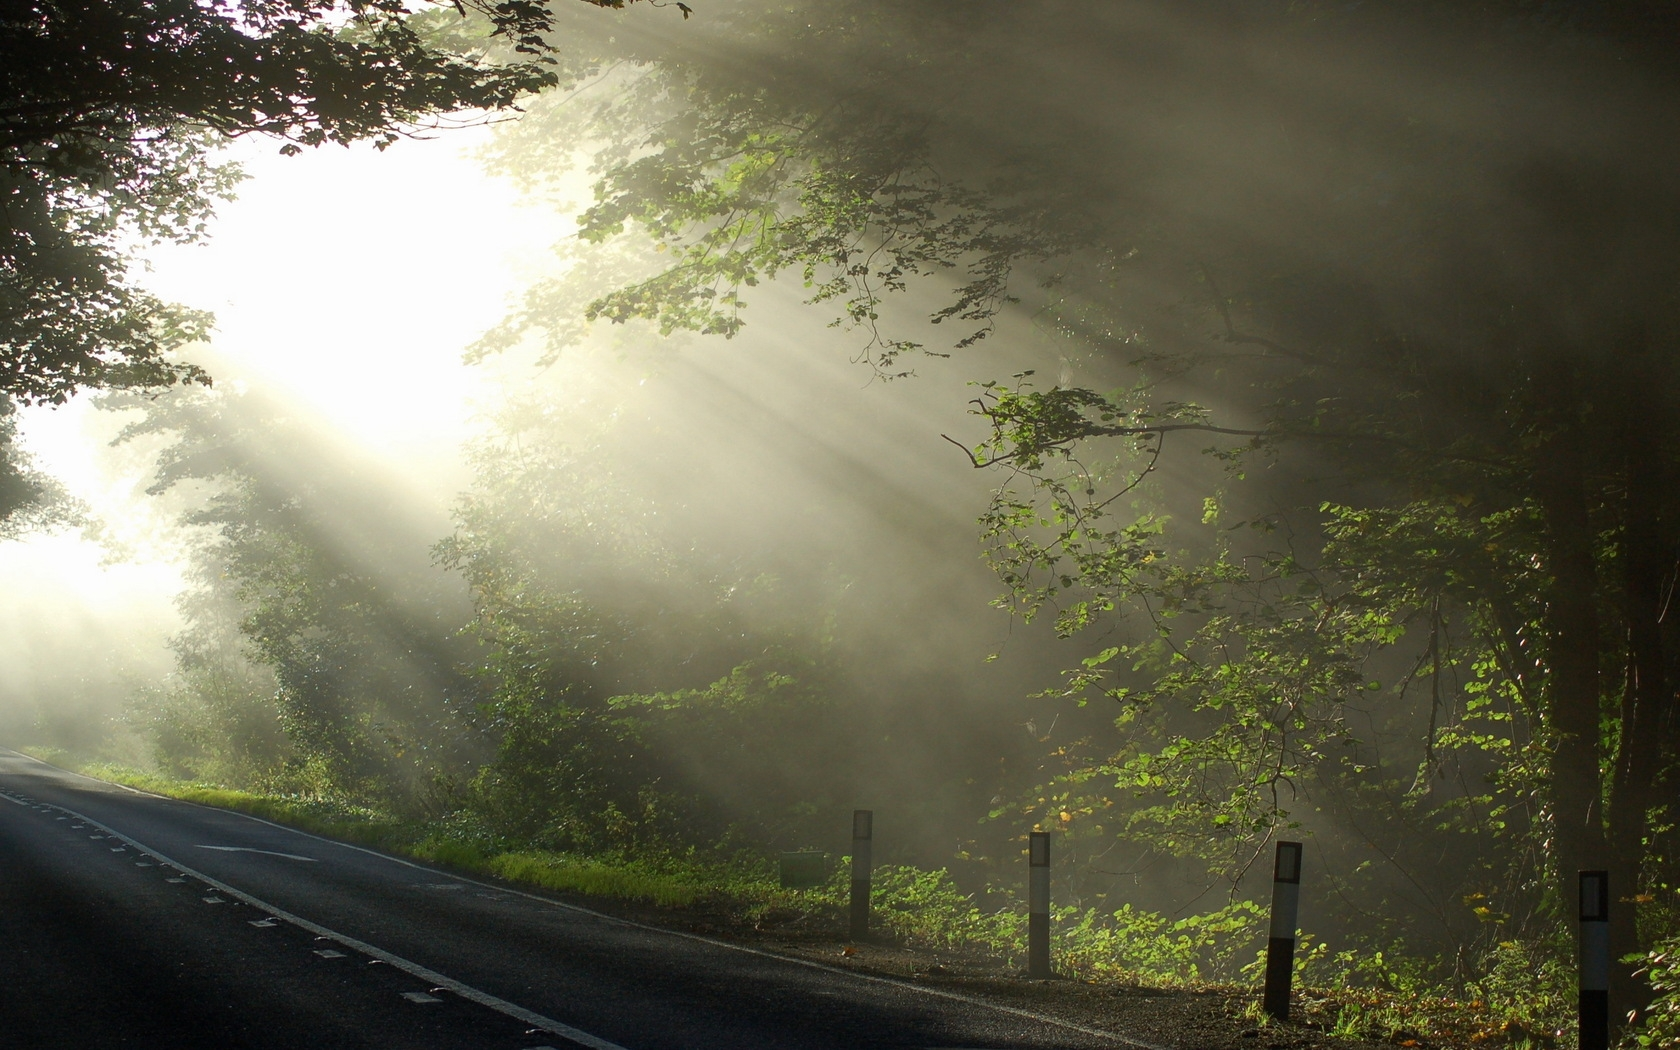 Sun, Beams, Morning, Road, Branches, Tree, Marking